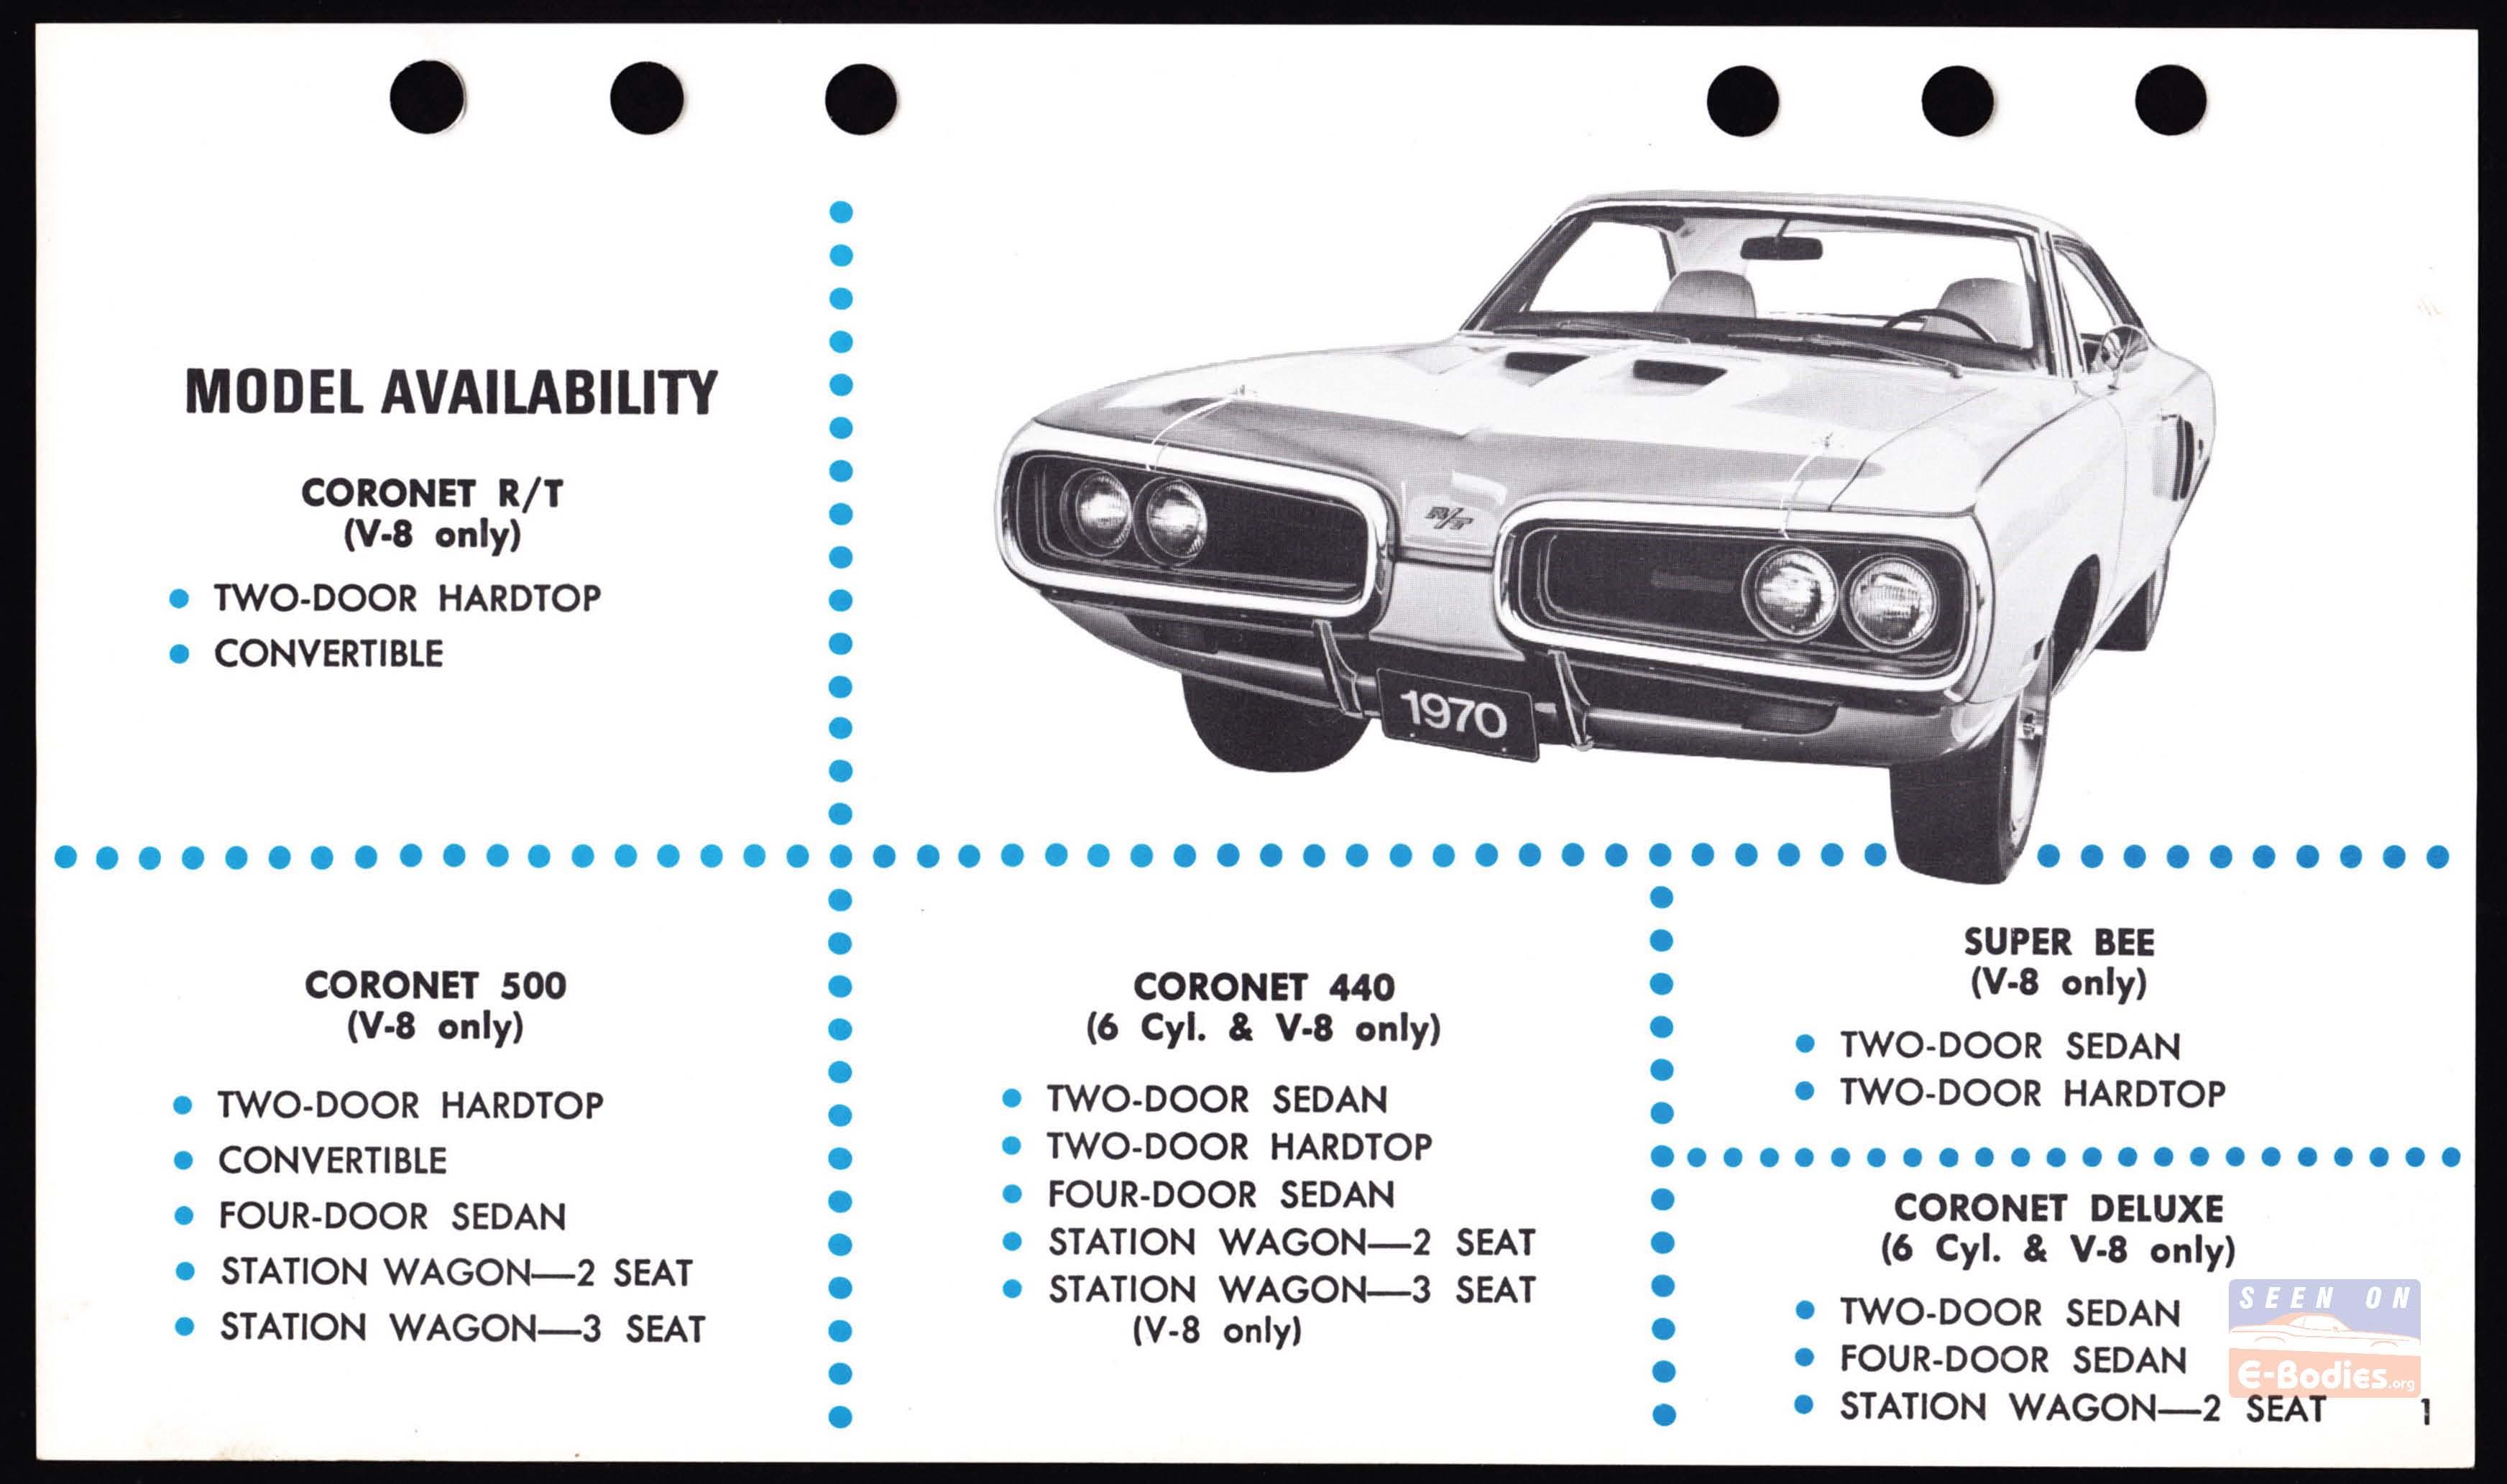 1970 Dodge Data Book Fast Facts Coronet